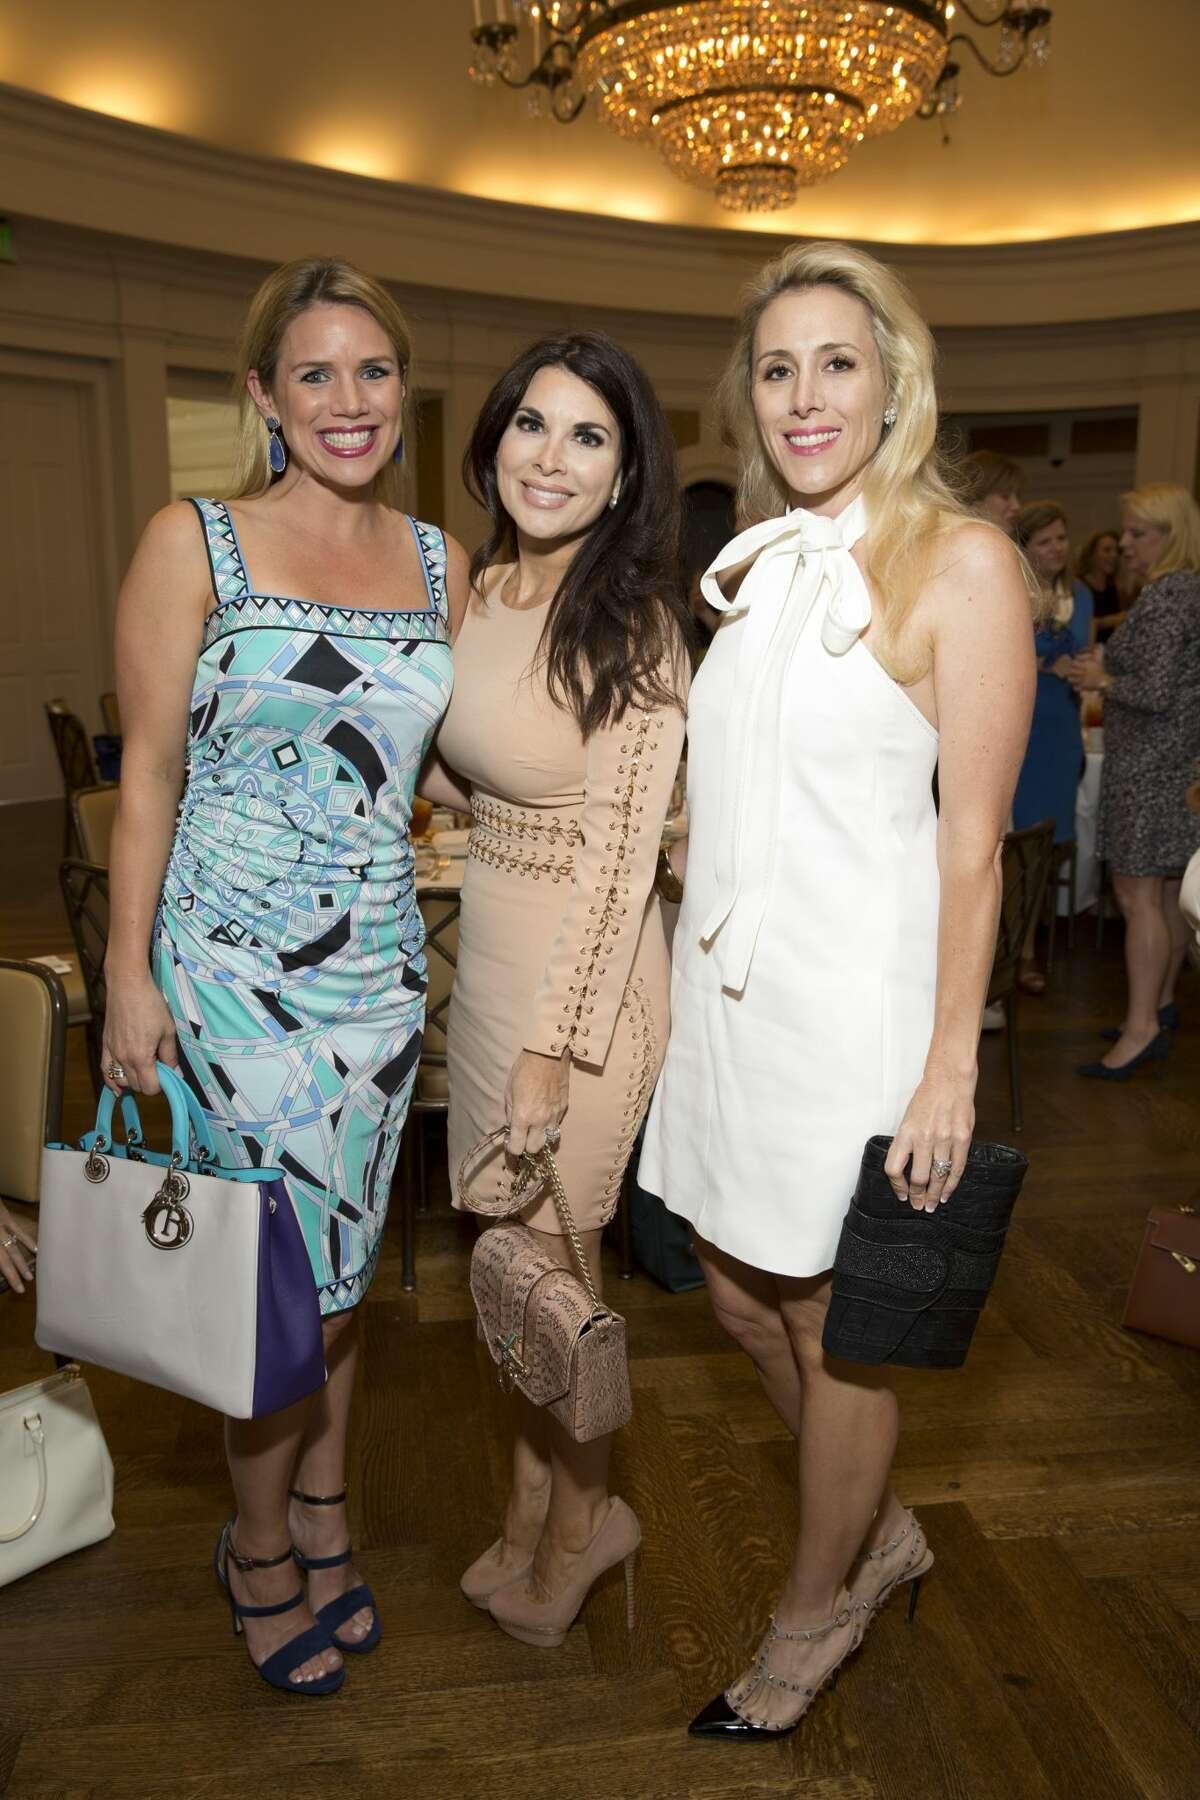 Amy Lee, Alissa Maples and Christie Sullivan